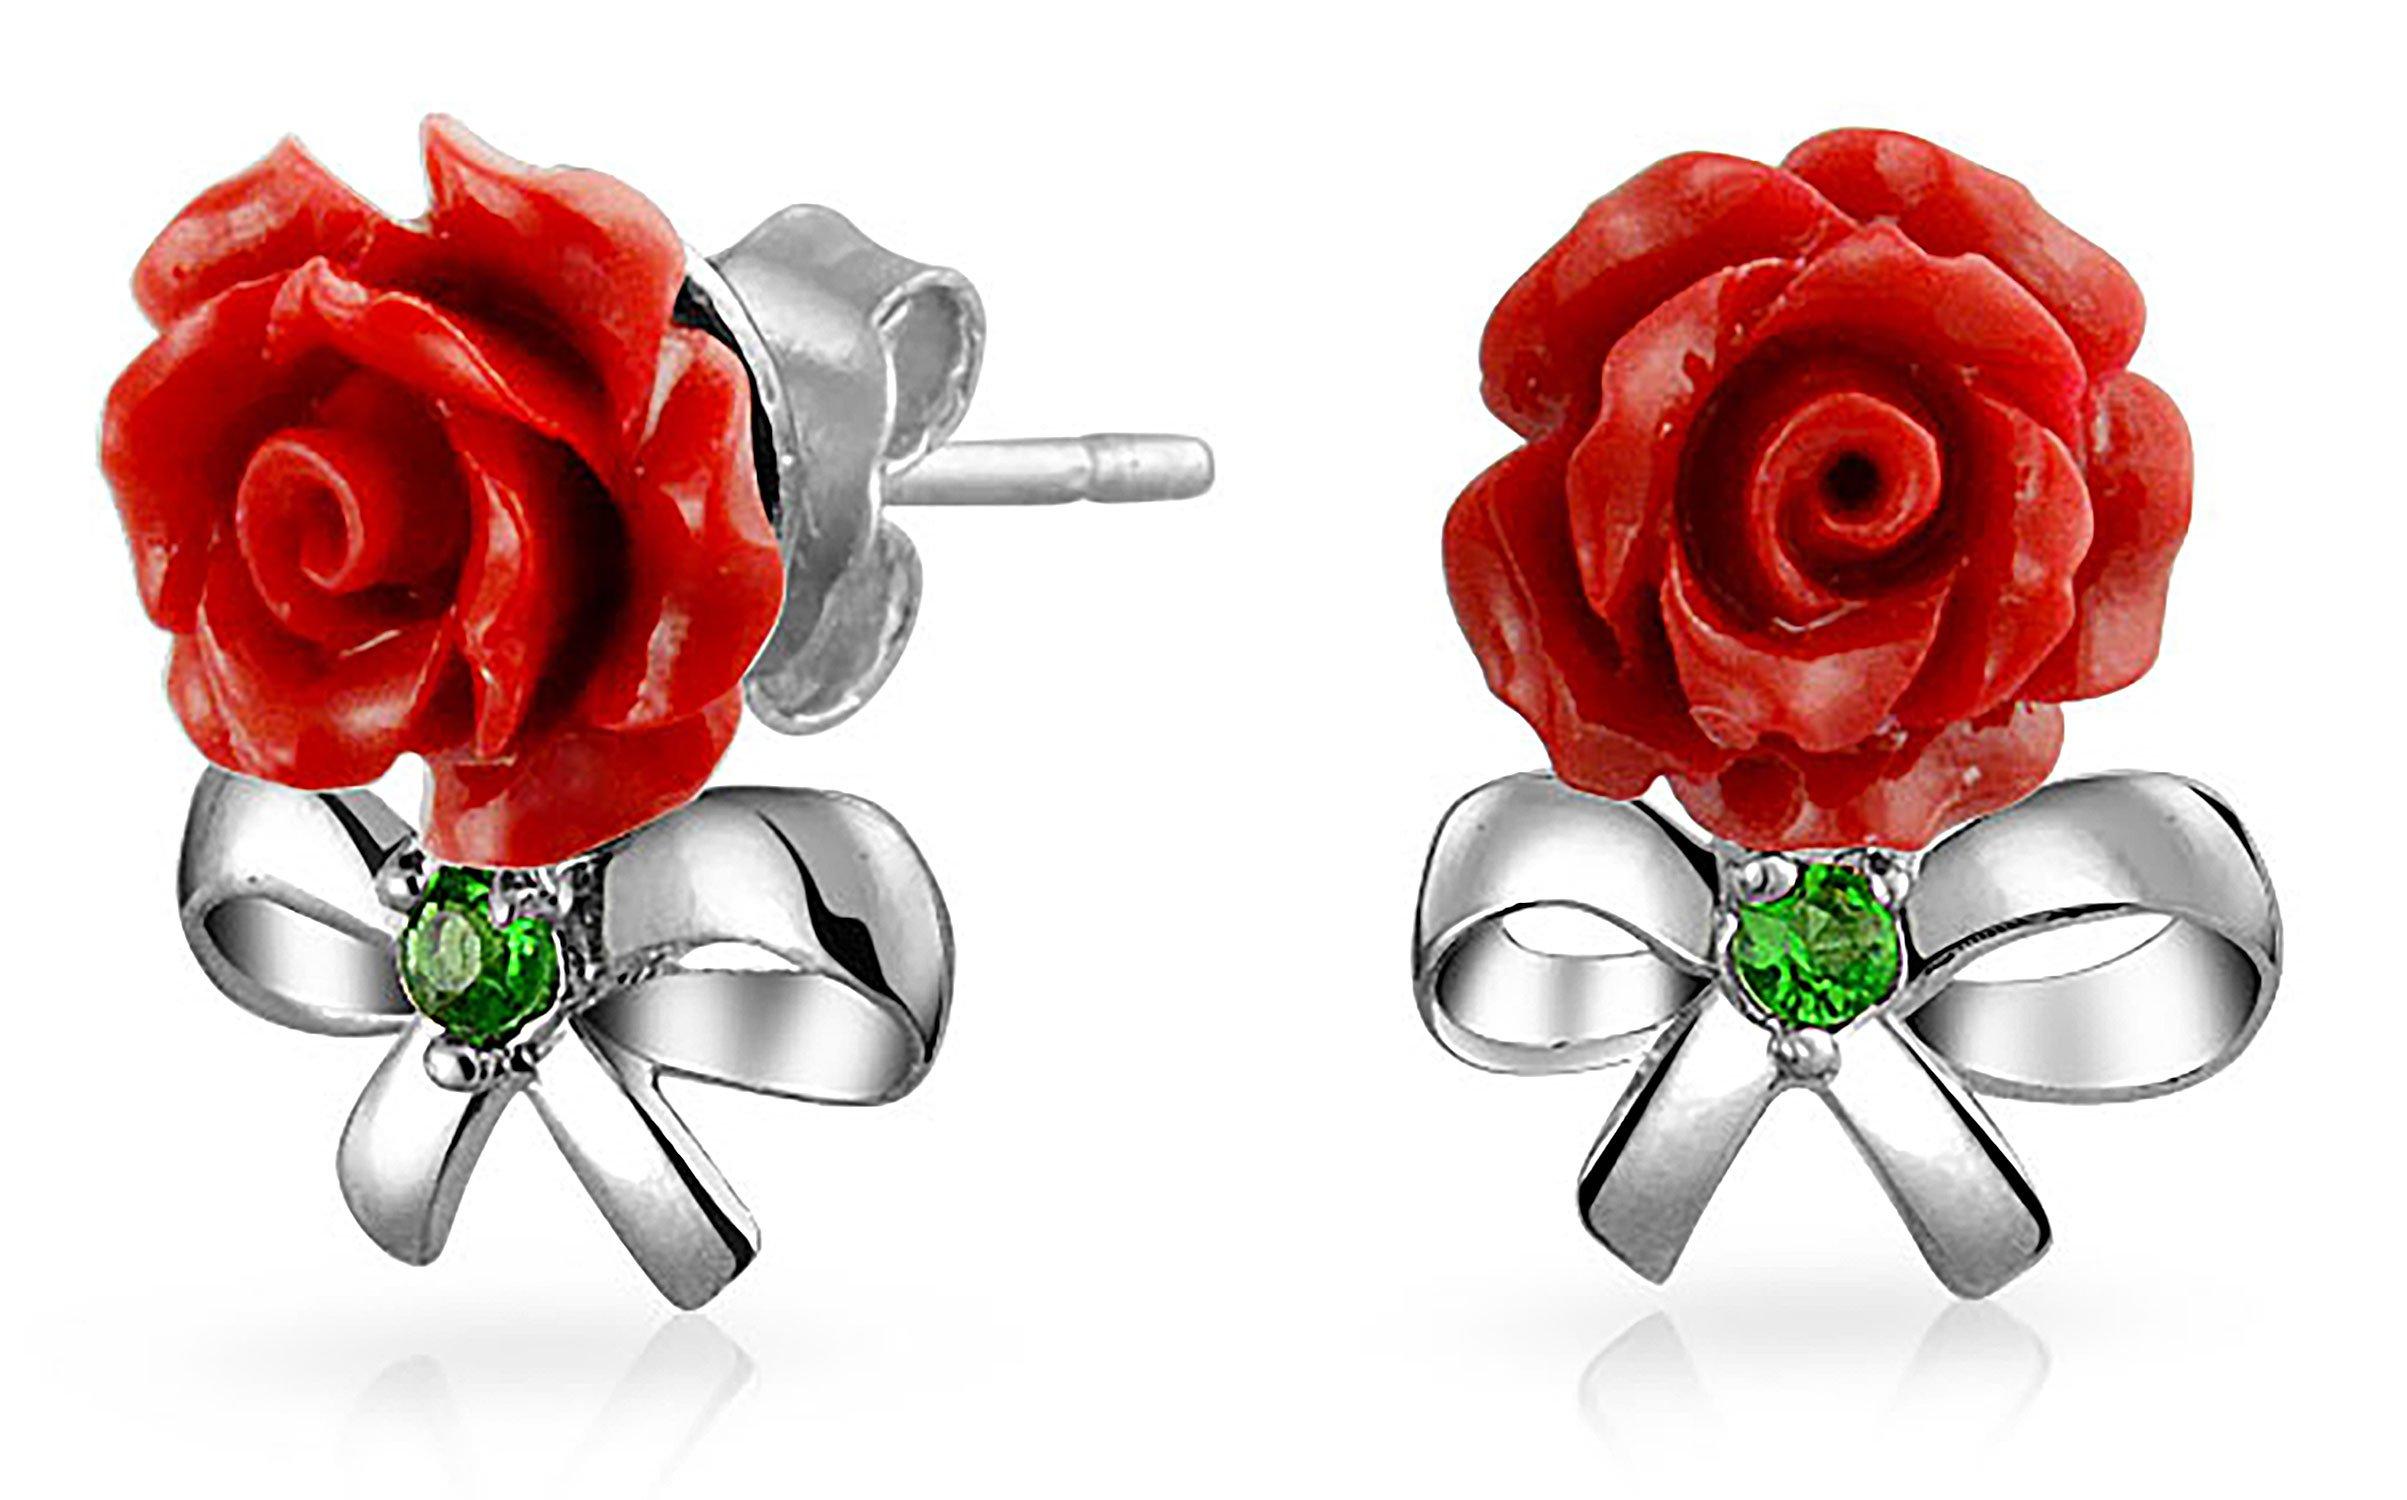 Flower CZ Bow Ribbon 3D Craved Red Rose Stud Earrings For Women For Teen 925 Sterling Silver